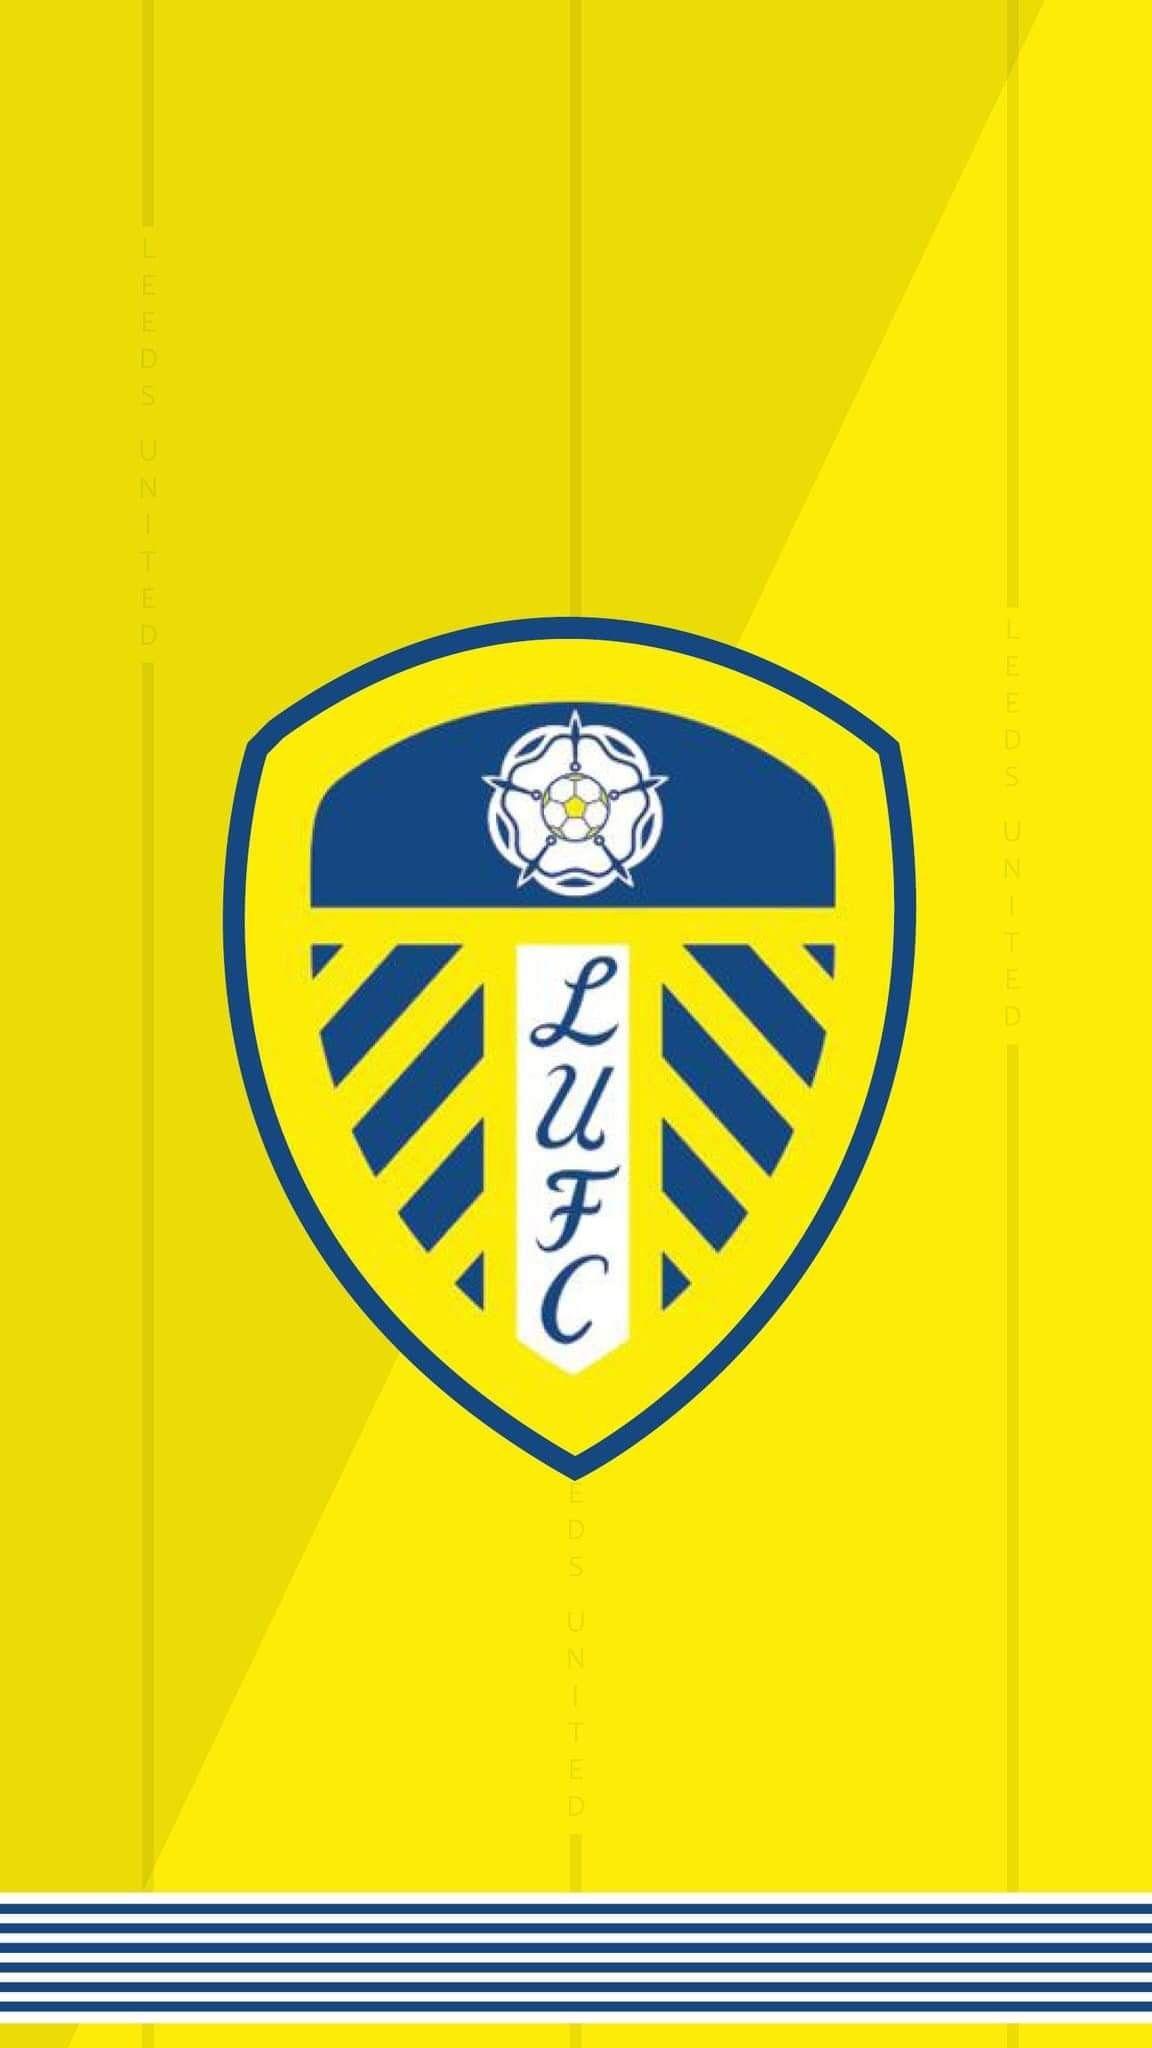 Pin by Rebjukebox 2015 on Leeds United FC #MOT #LUFC #ALAW ...